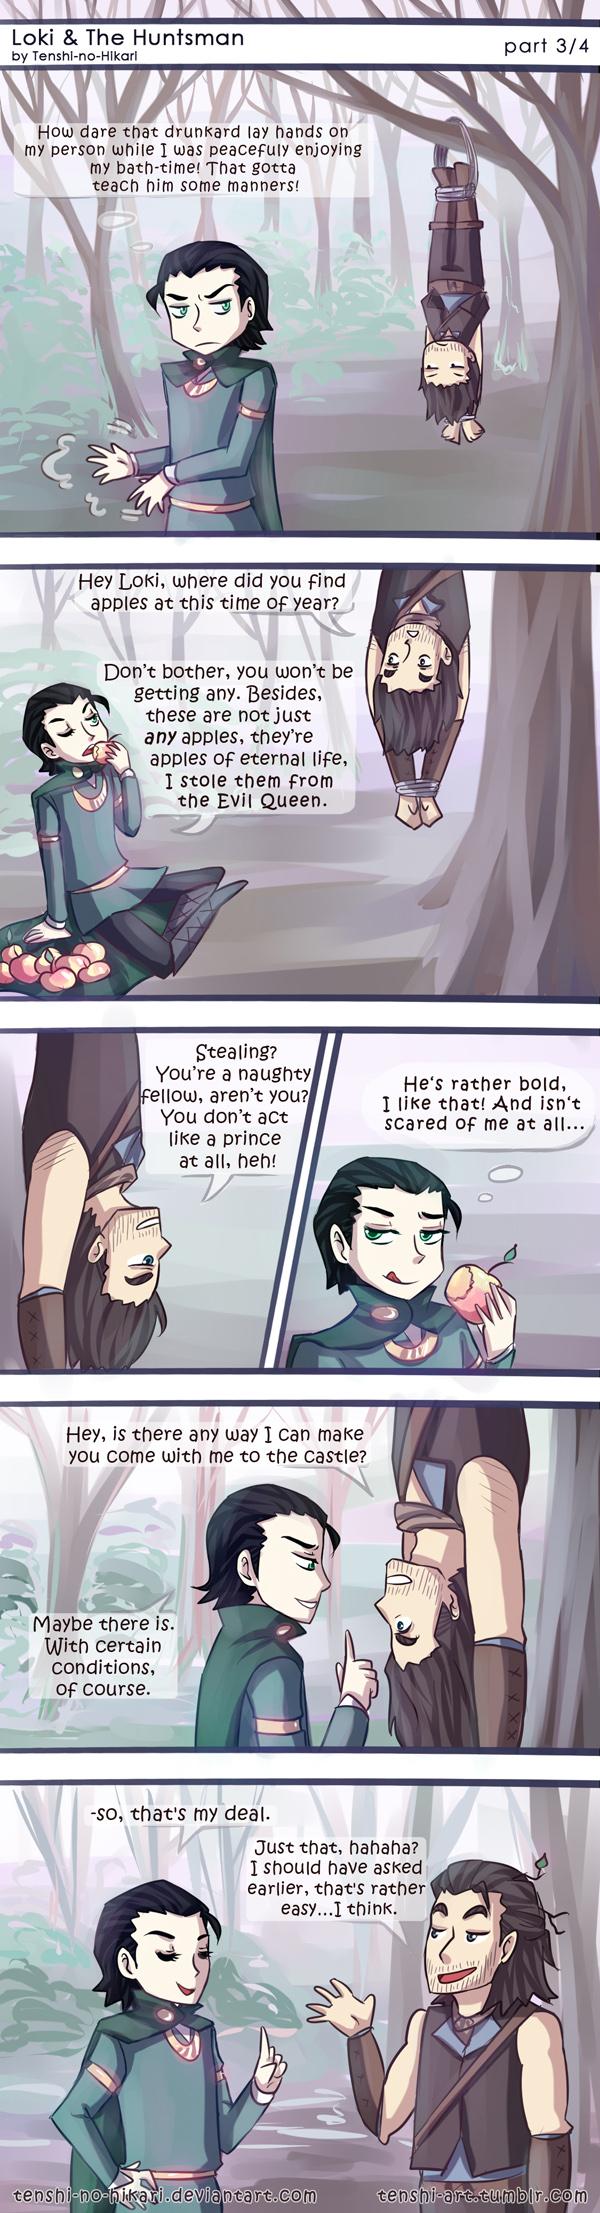 Loki and The Huntsman -part 03- by Tenshi-no-Hikari